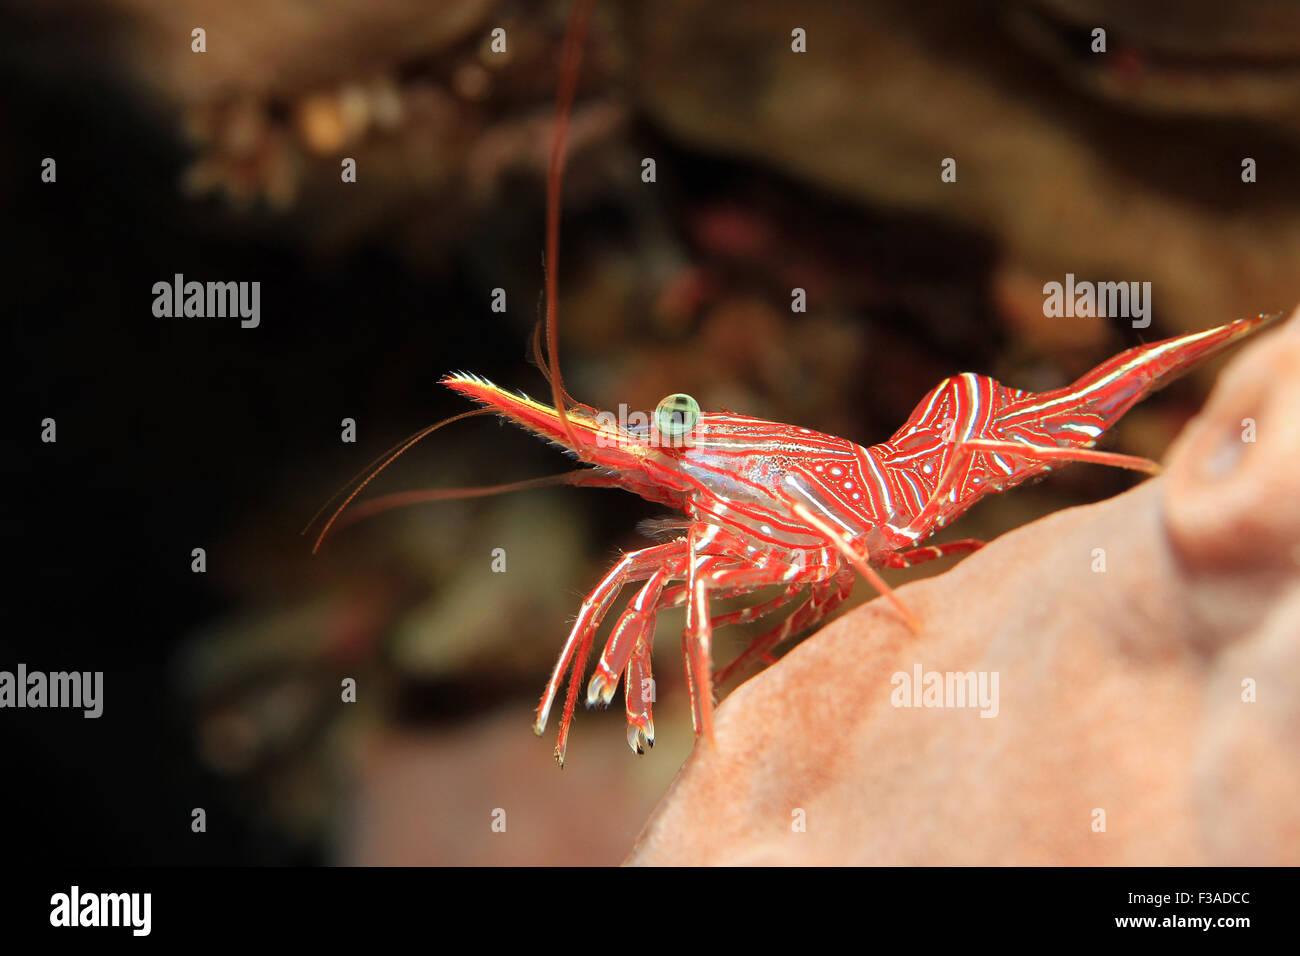 Durban Dancing Shrimp (Rhynchocinetes Durbanensis, aka Hingebeak Prawn, Hinge-beak Shrimp). Padang Bai, Bali, Indonesia Stock Photo